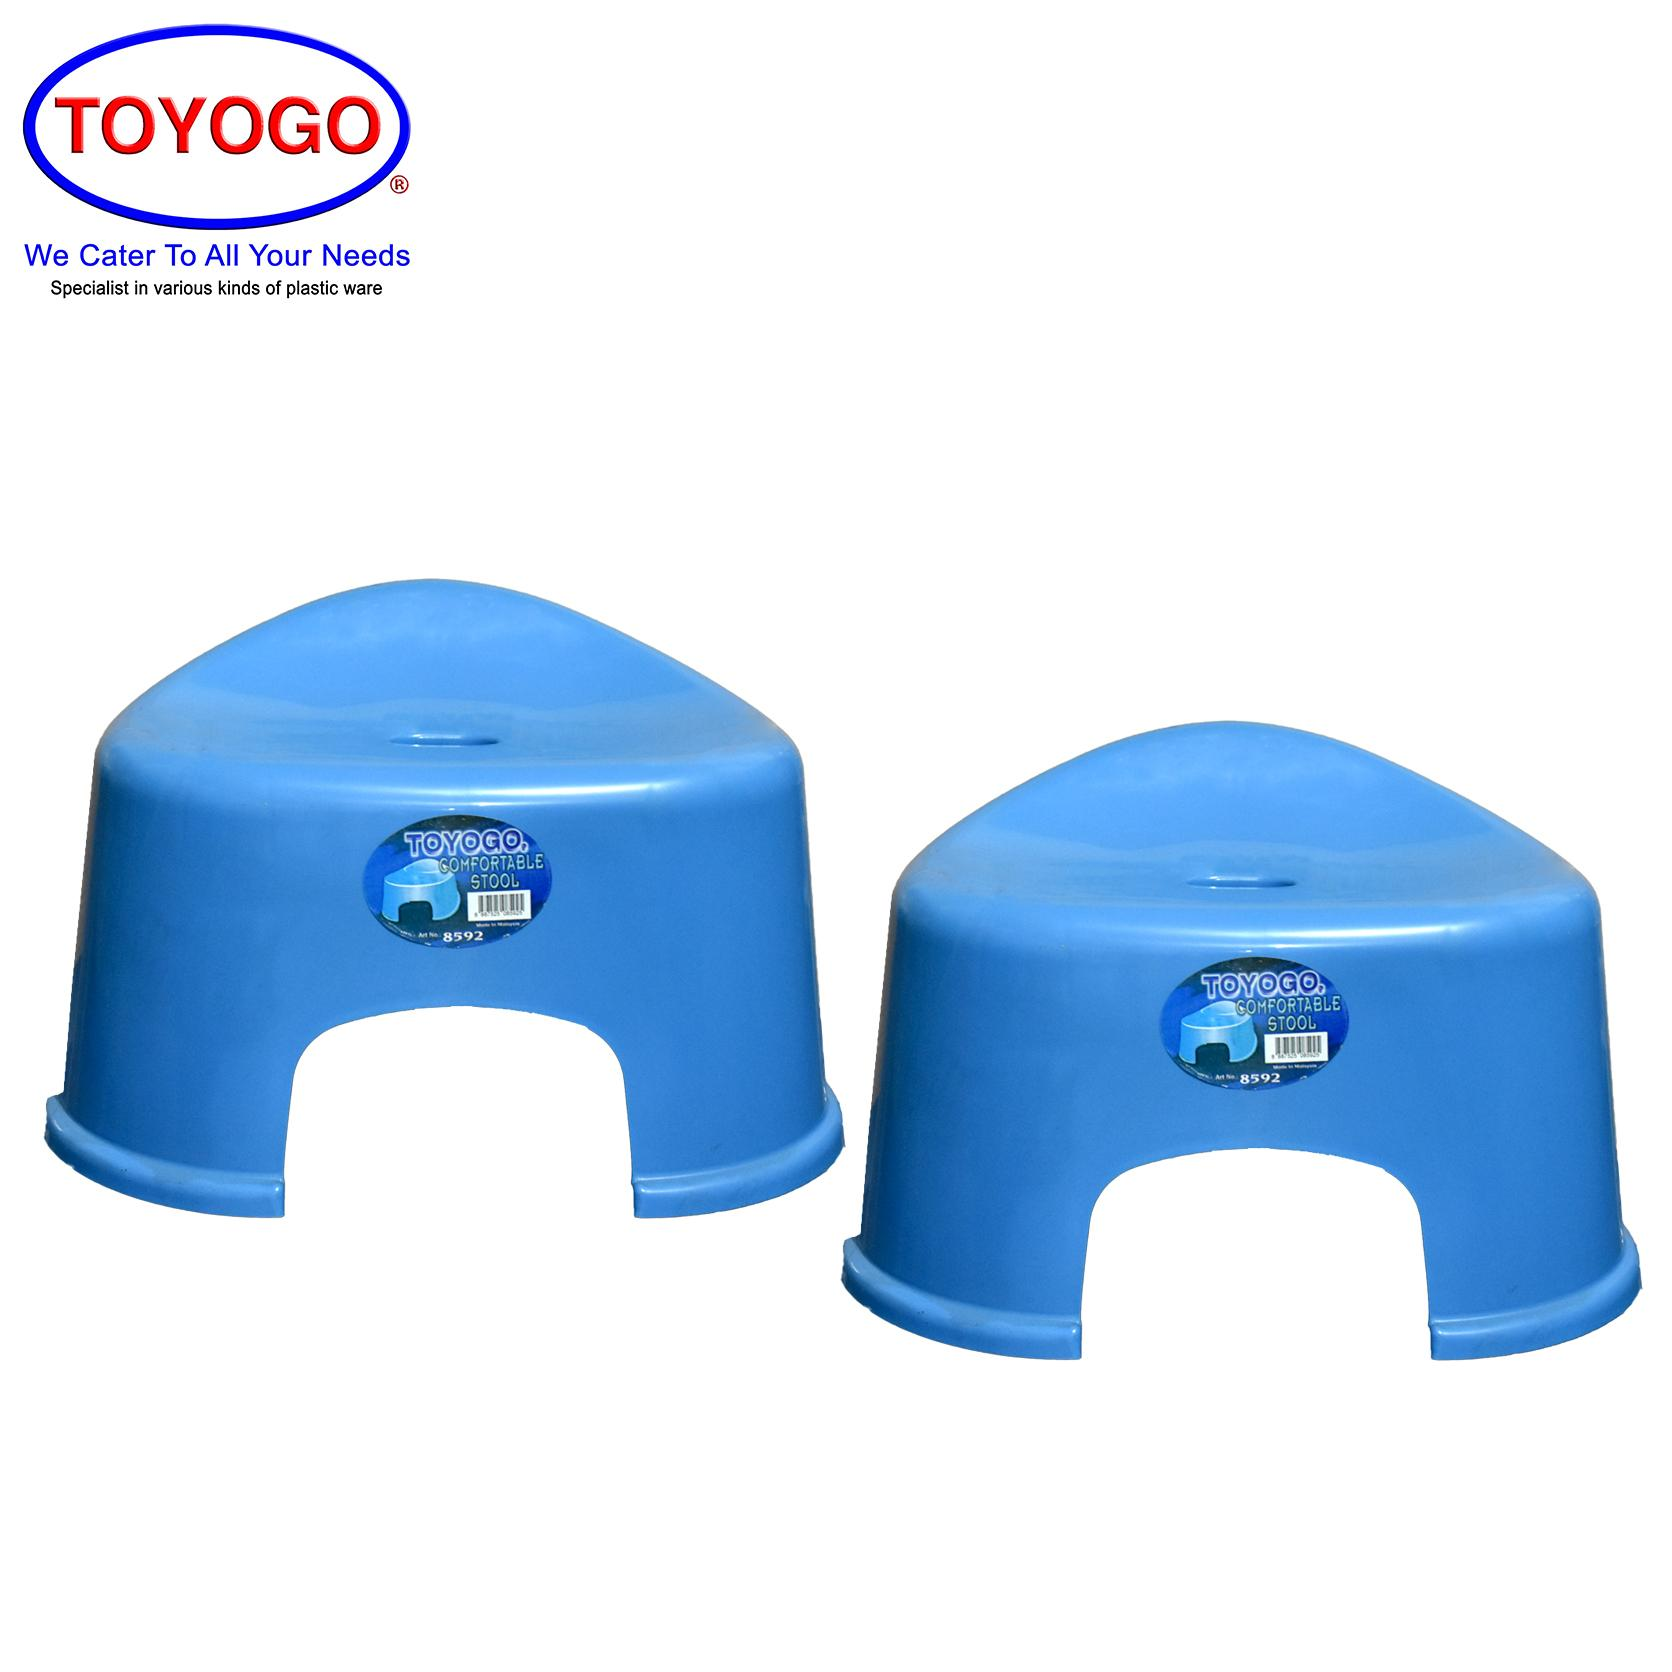 Toyogo Plastic Comfortable Stool (Bundle of 2) (8592)